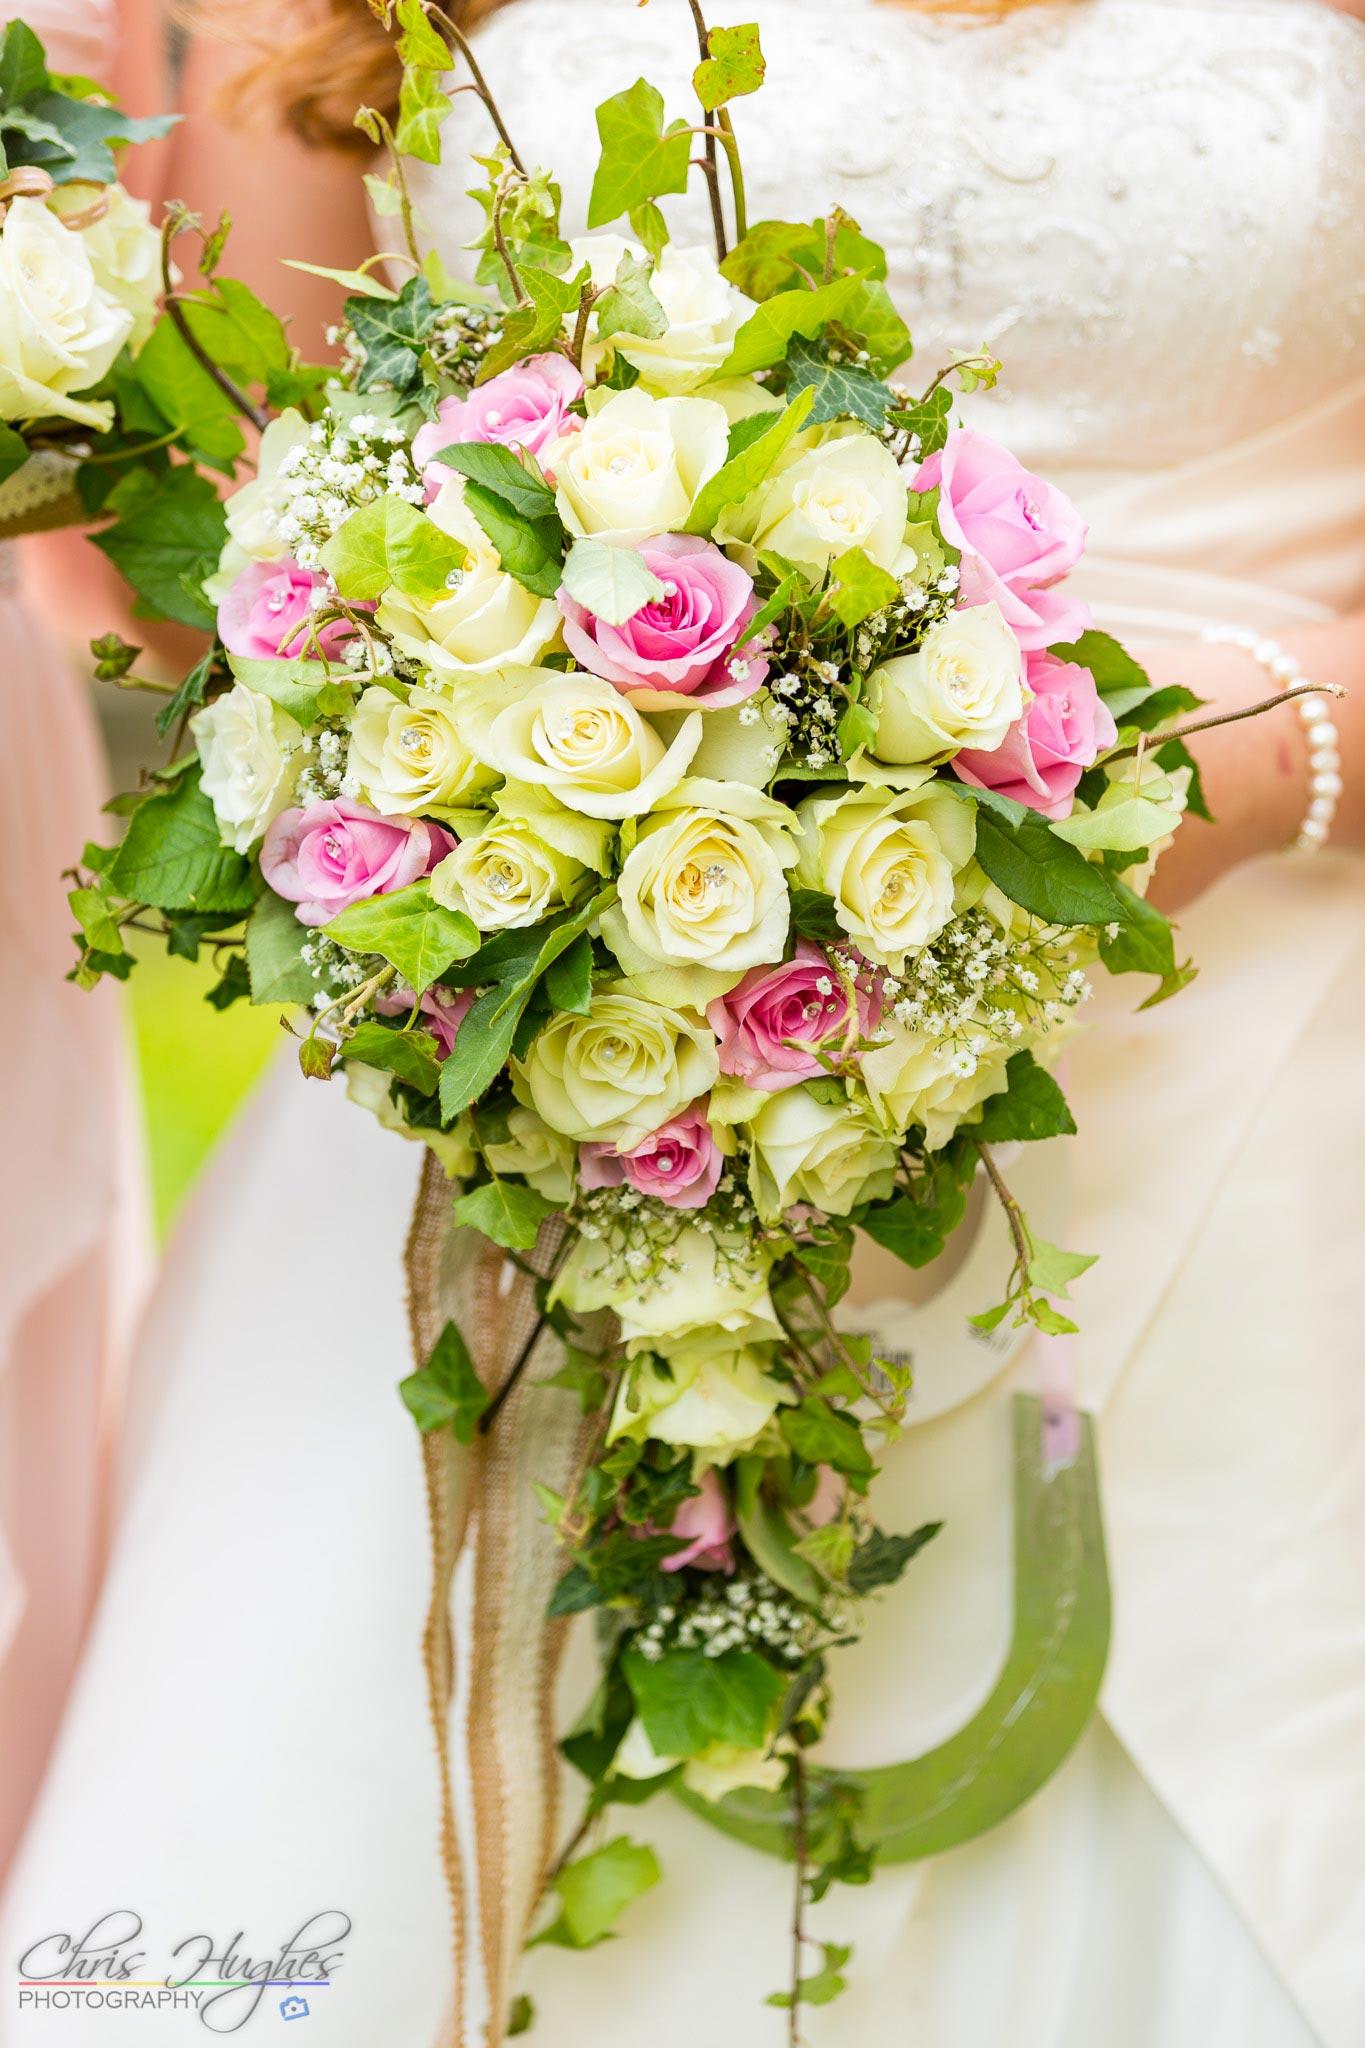 17 adam charlotte wedding flowers bishop auckland durham chris hughes photography. Black Bedroom Furniture Sets. Home Design Ideas